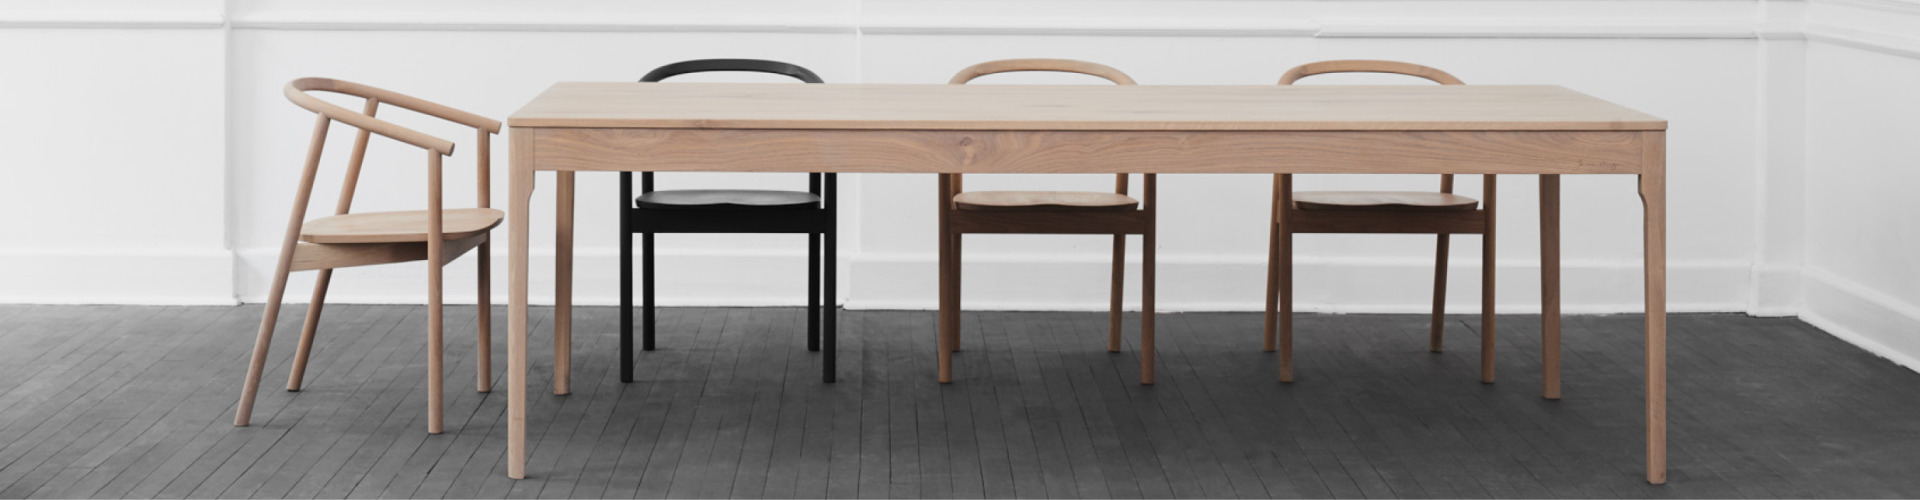 James Mudge Furniture Studio